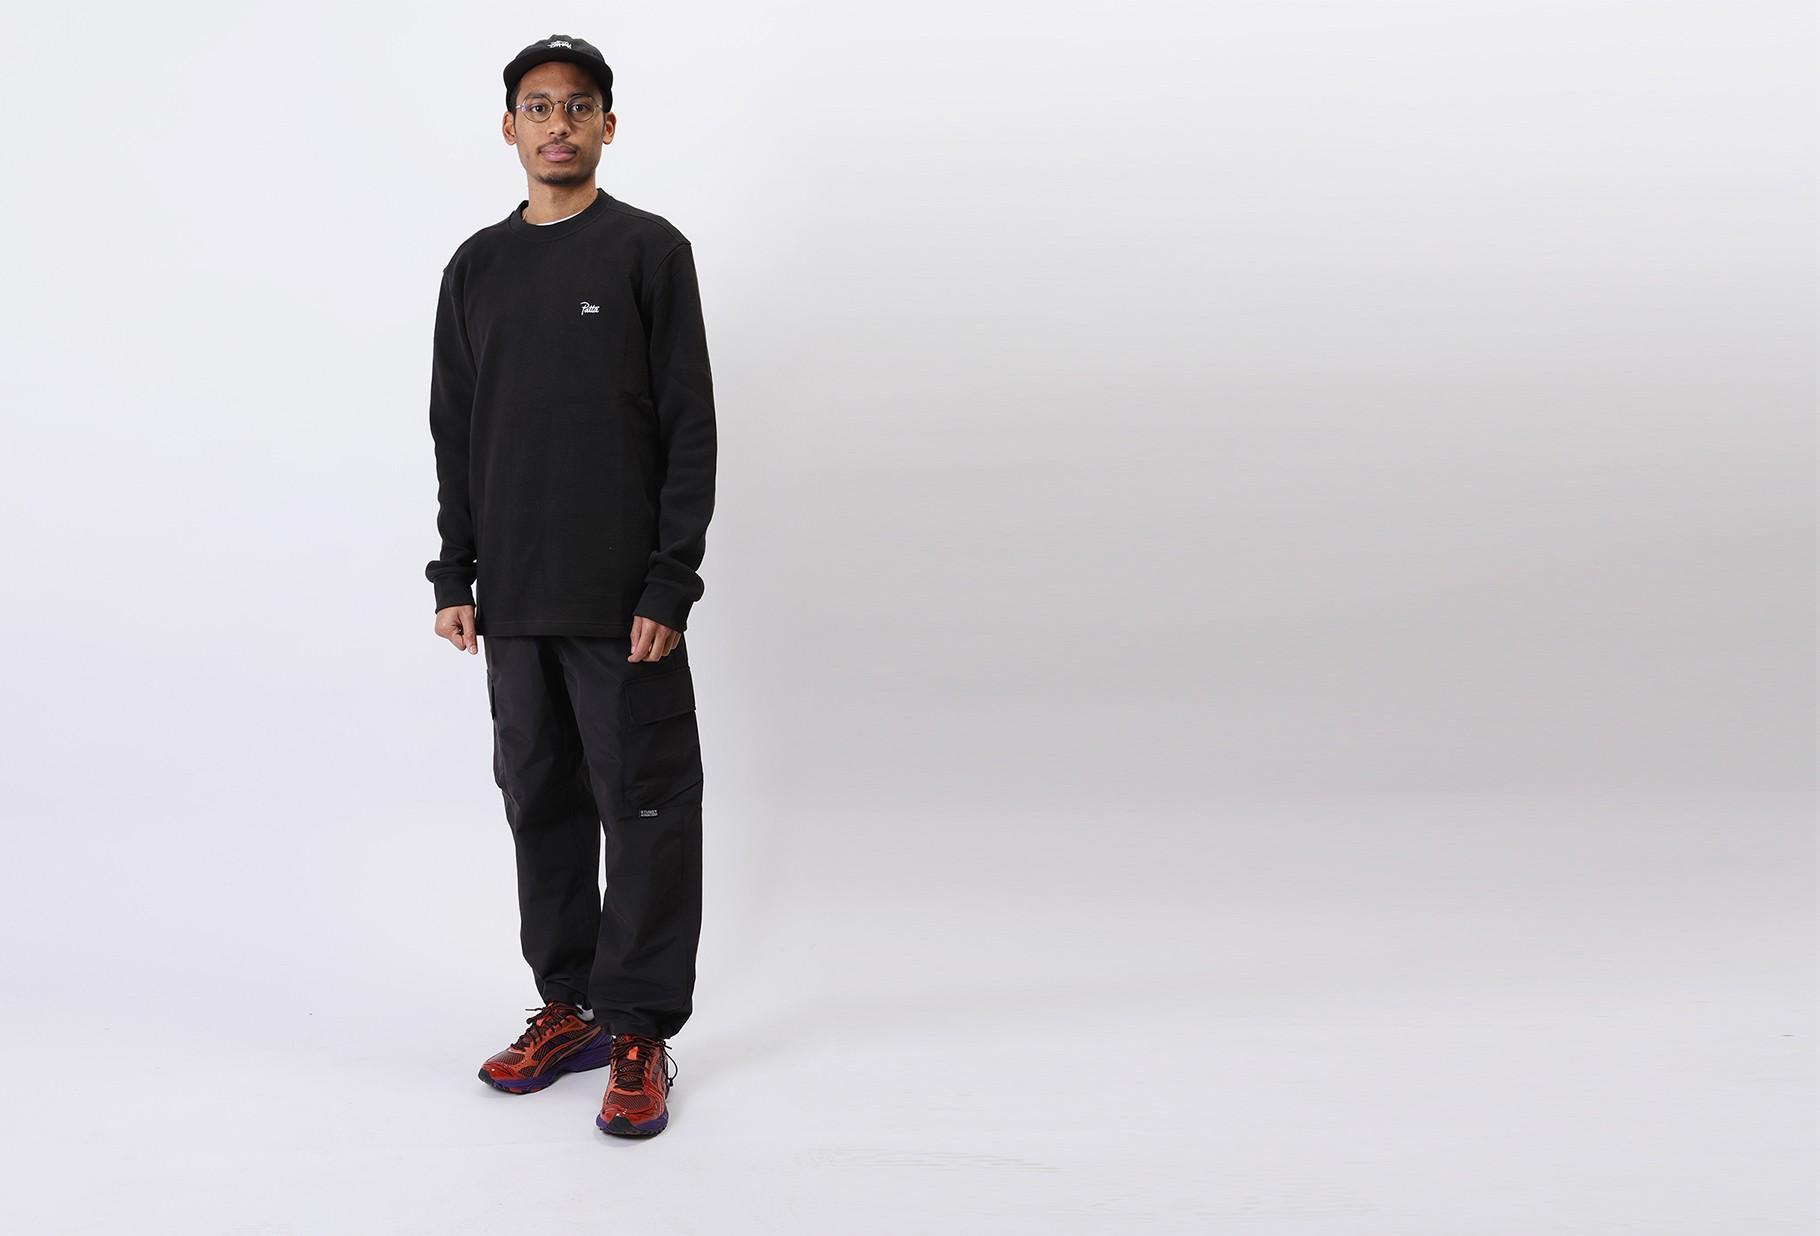 PATTA / Patta waffle thermal ls tshirt Black